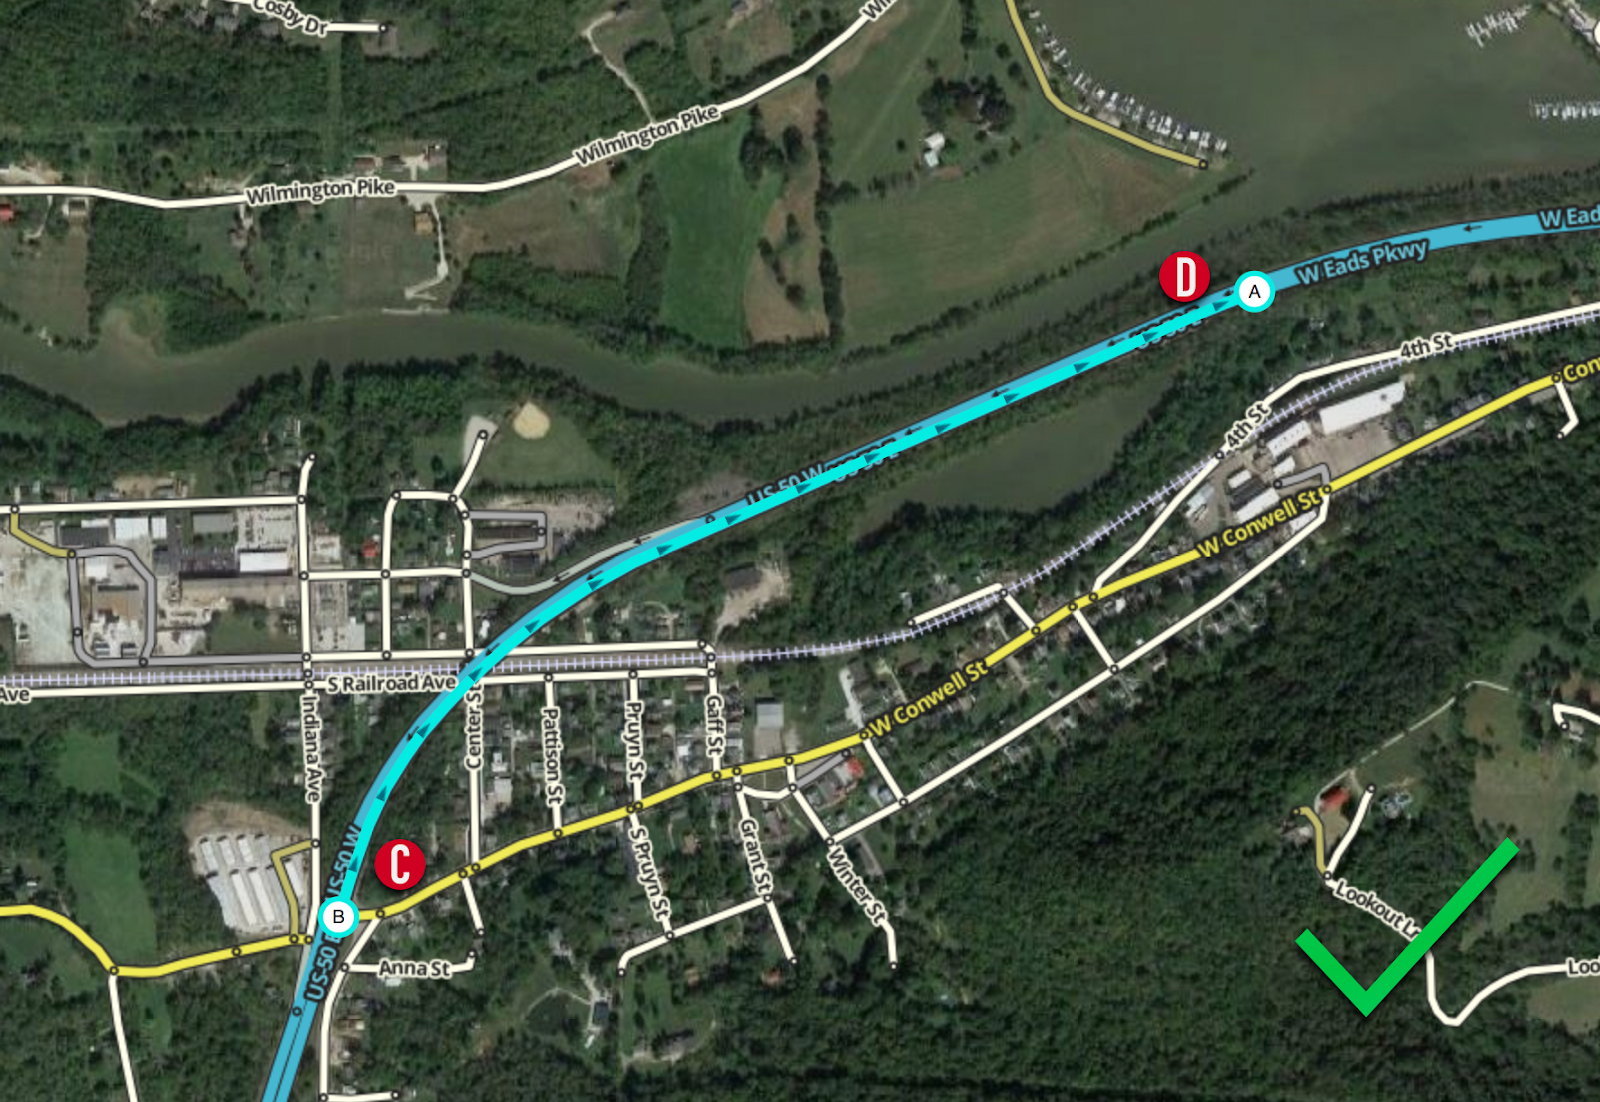 Road Closures Map Waze | Google Developers